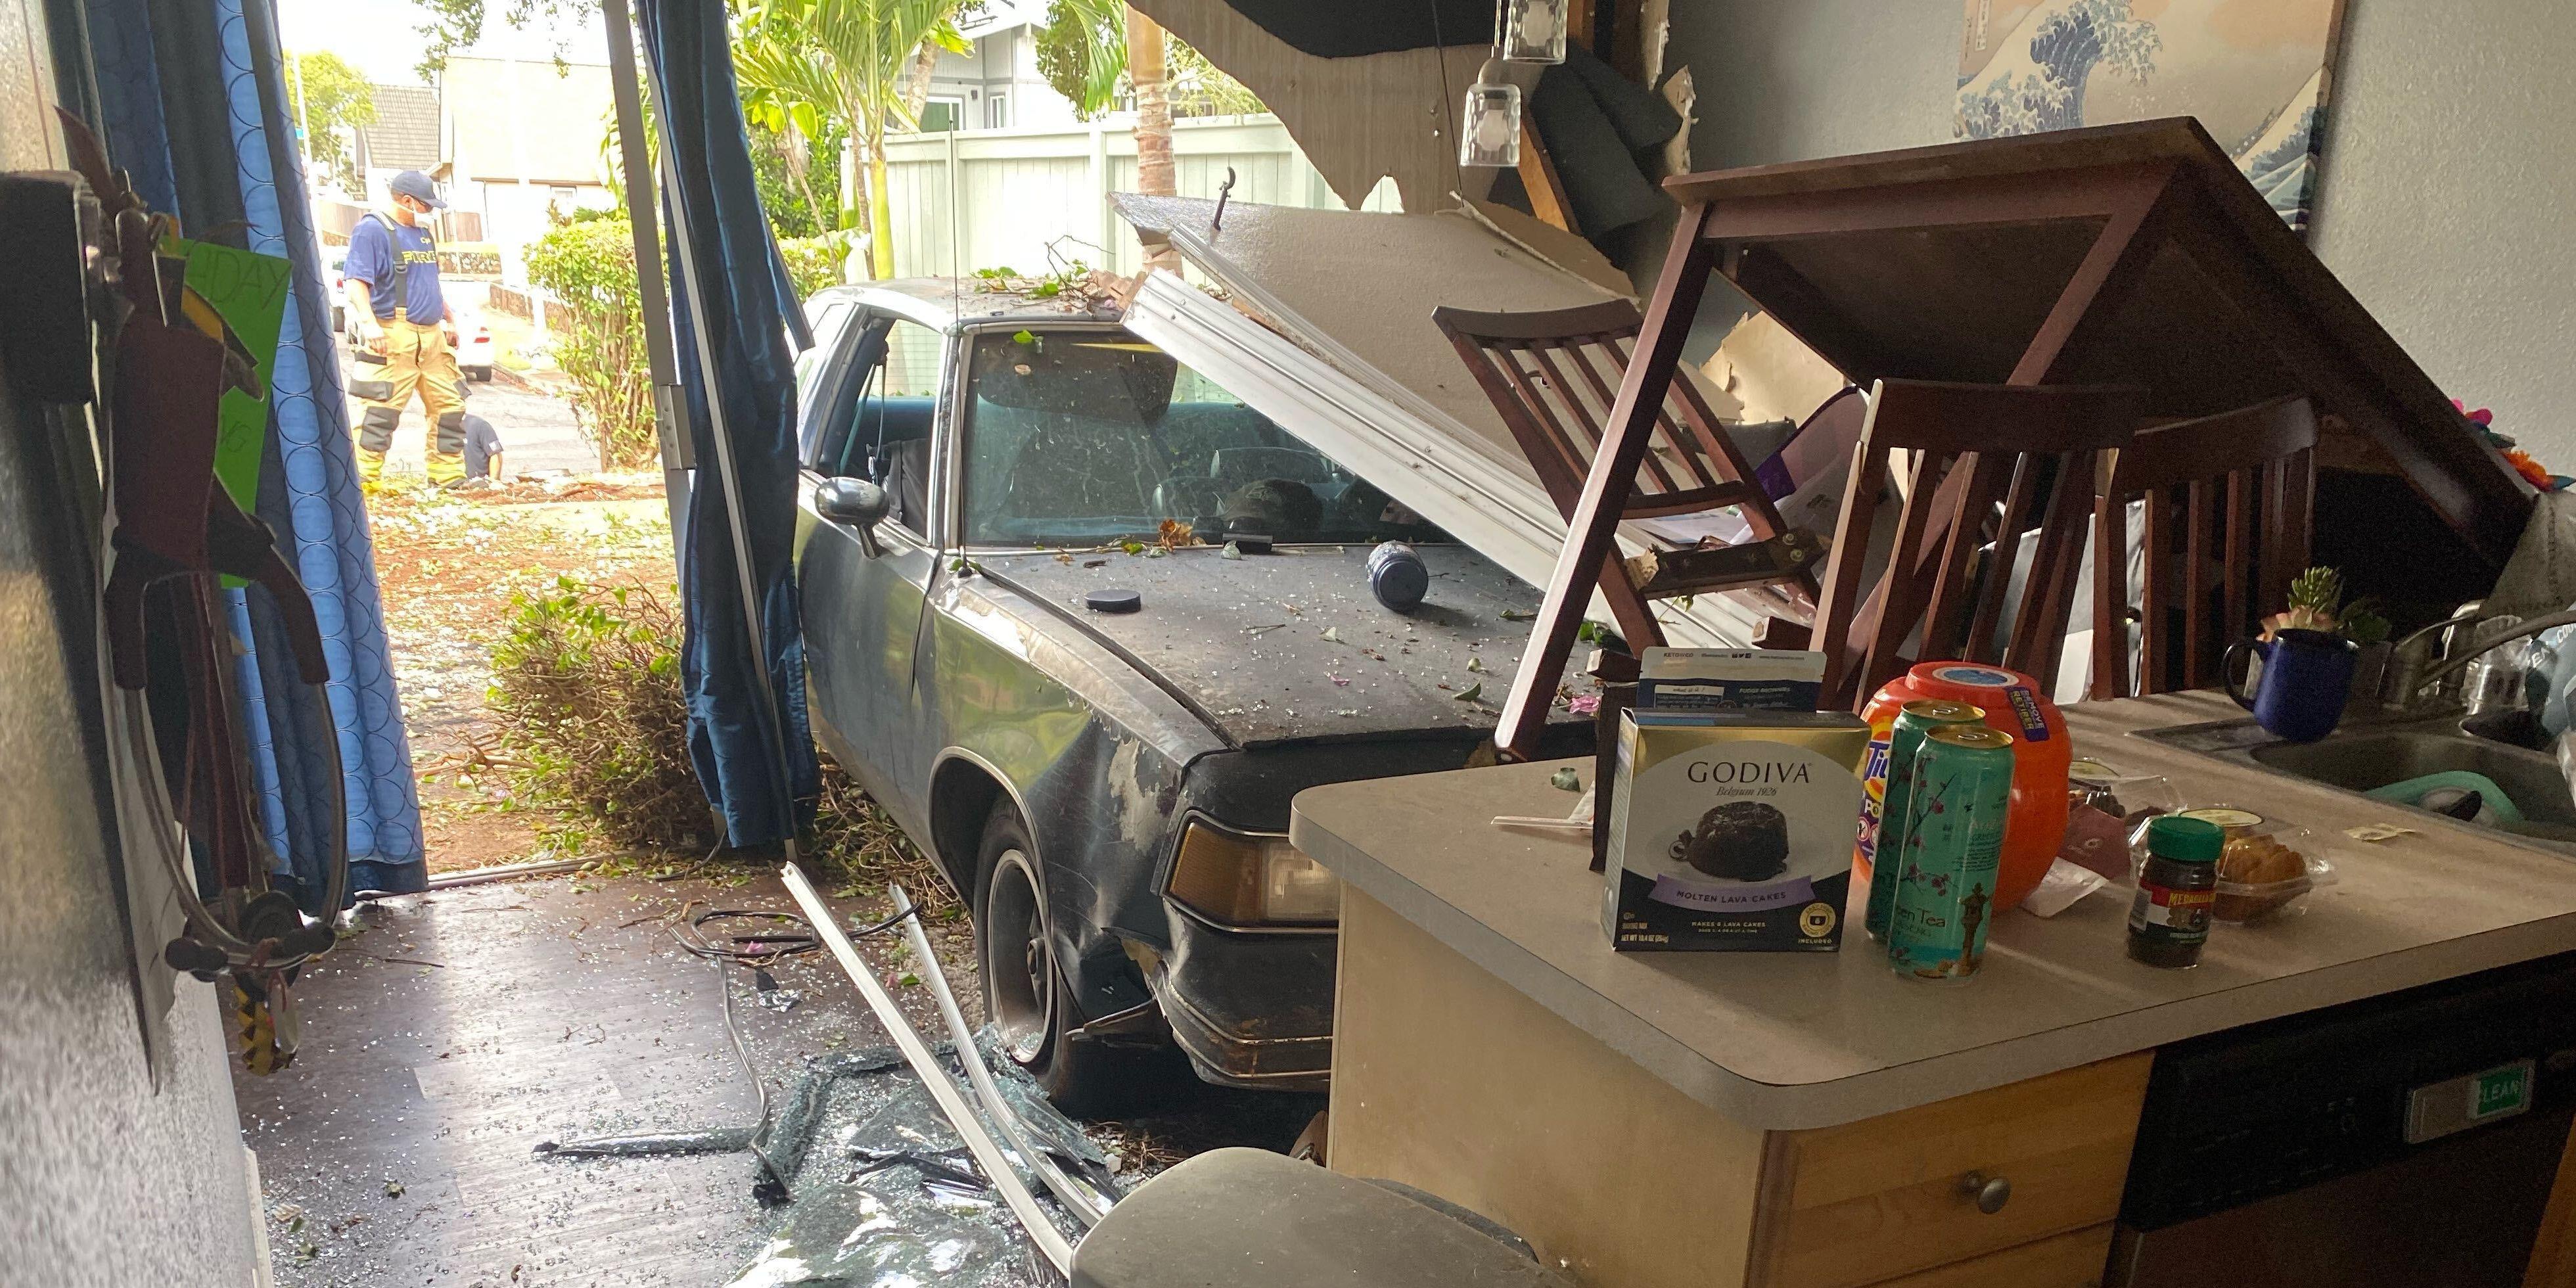 Car loses control, drives into Mililani townhouse